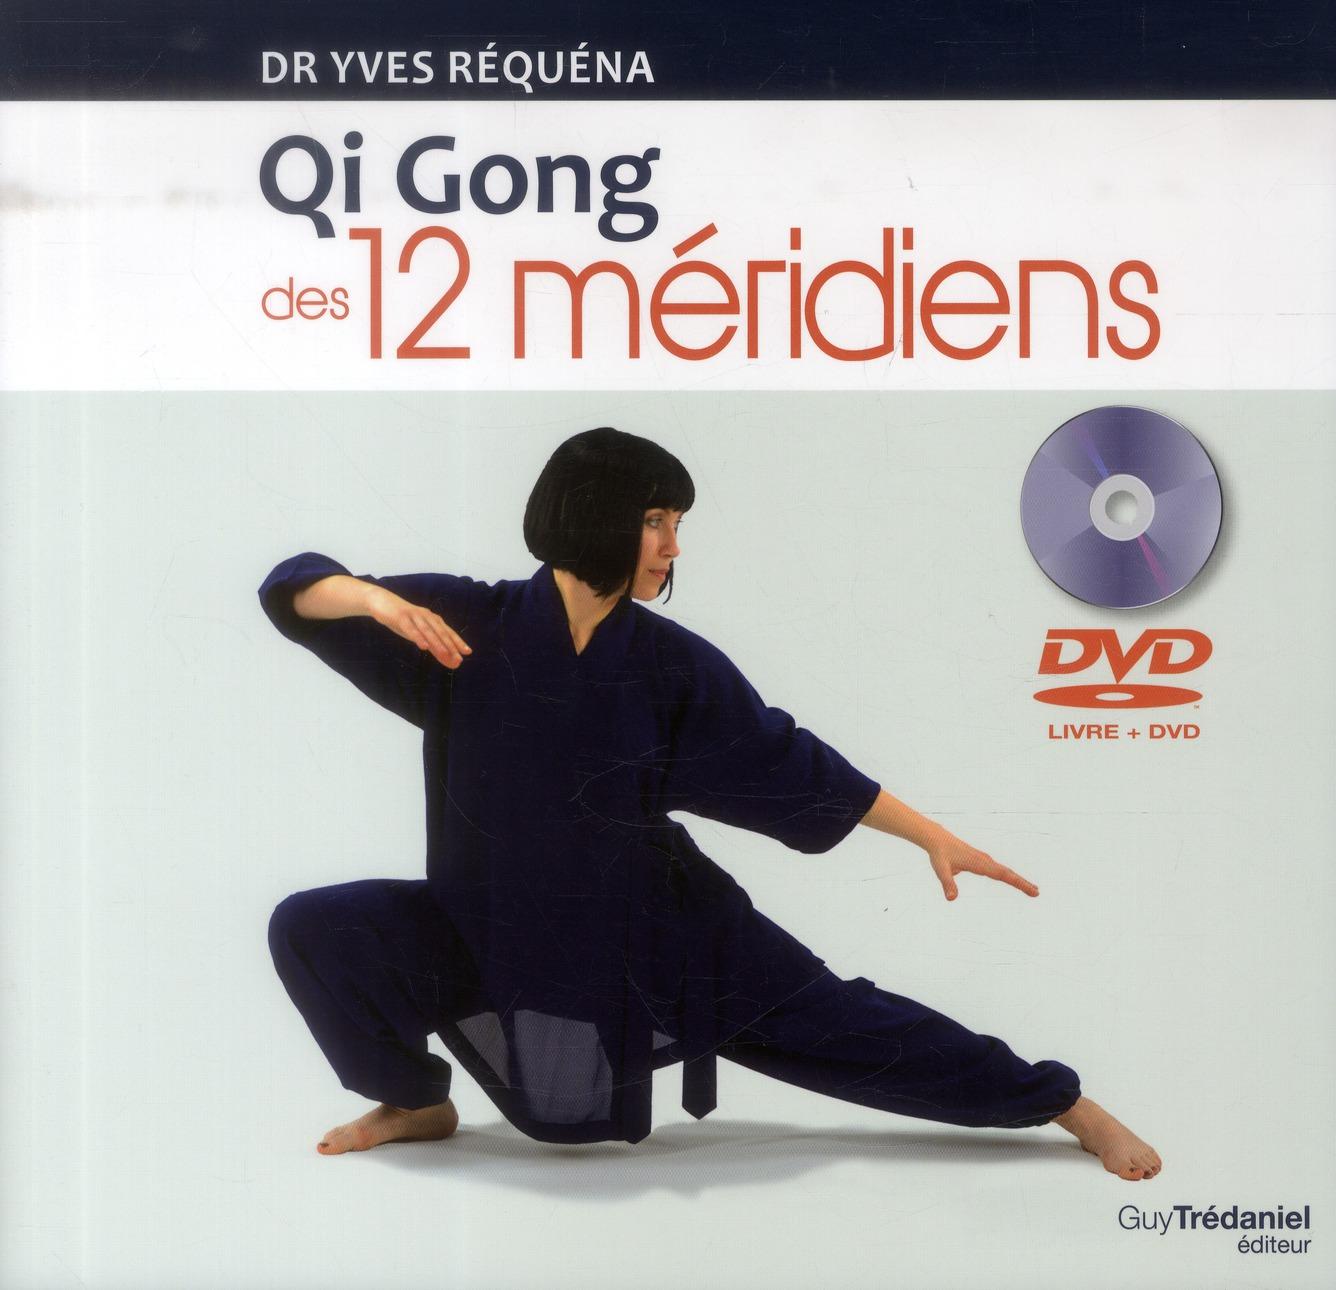 QI GONG DES 12 MERIDIENTS